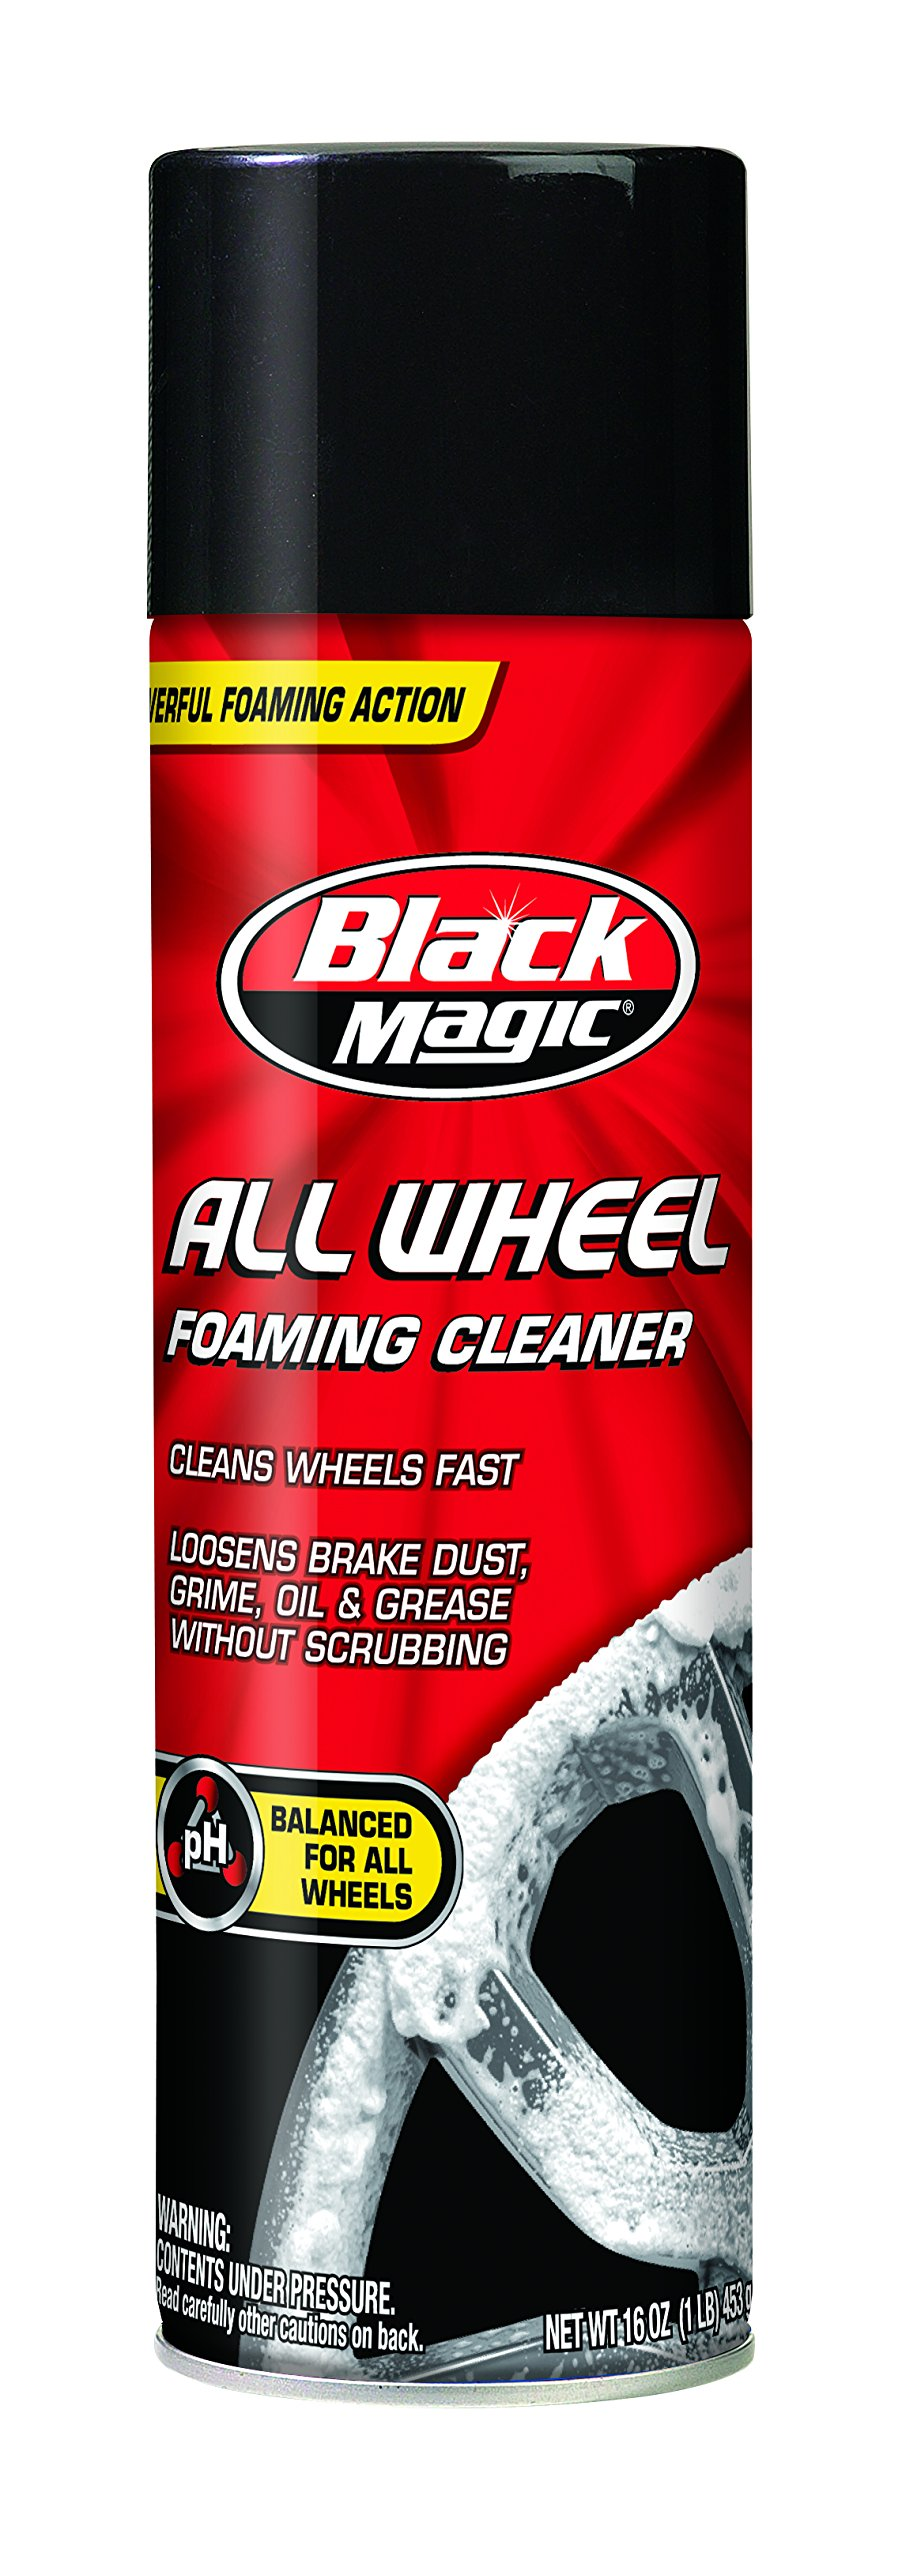 Black Magic 120009-6PK Foaming All Wheel Cleaner, 16 oz. (Pack of 6)